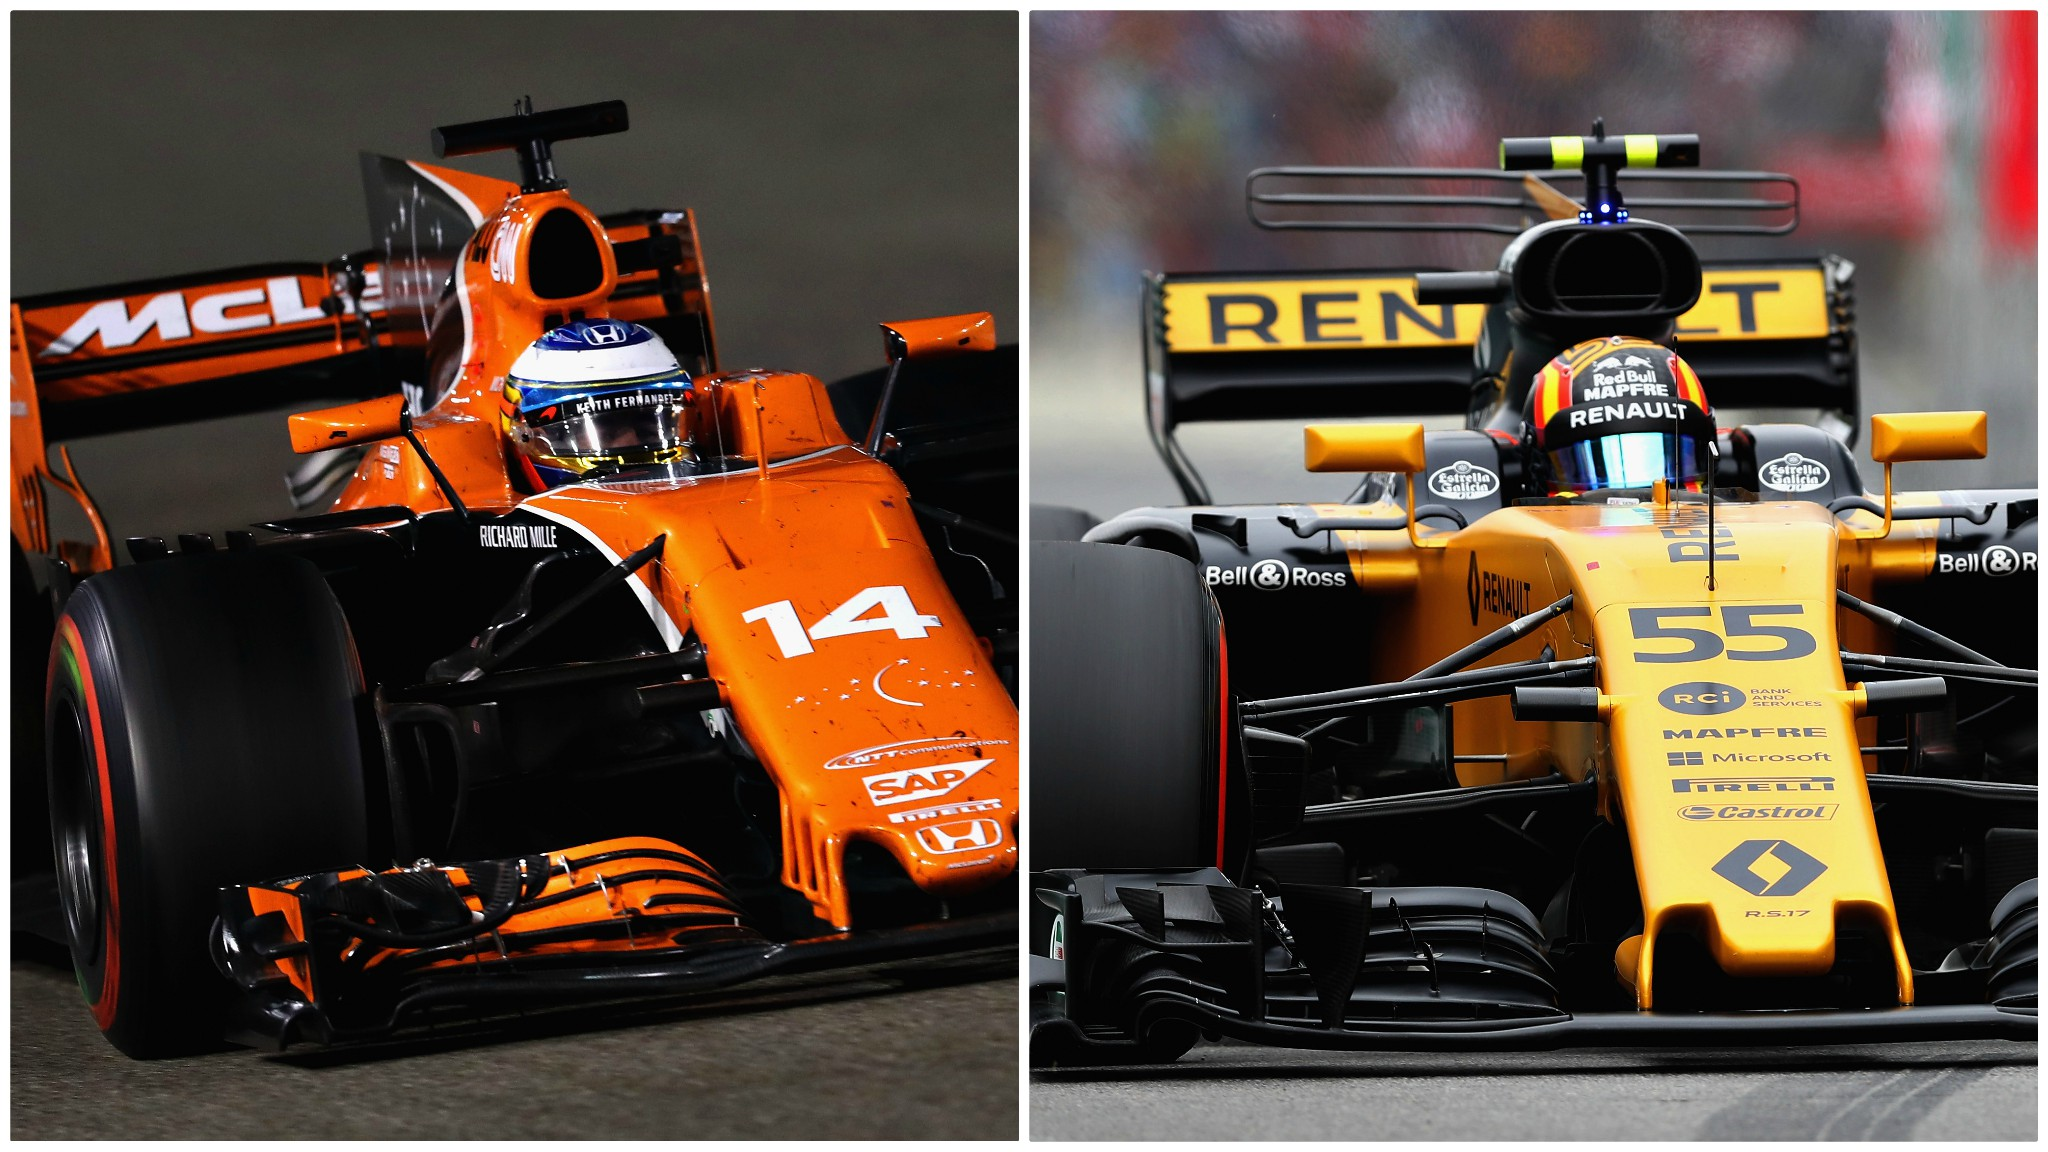 Gossip: Mercedes, McLaren, Renault, Bottas, Sirotkin, Williams